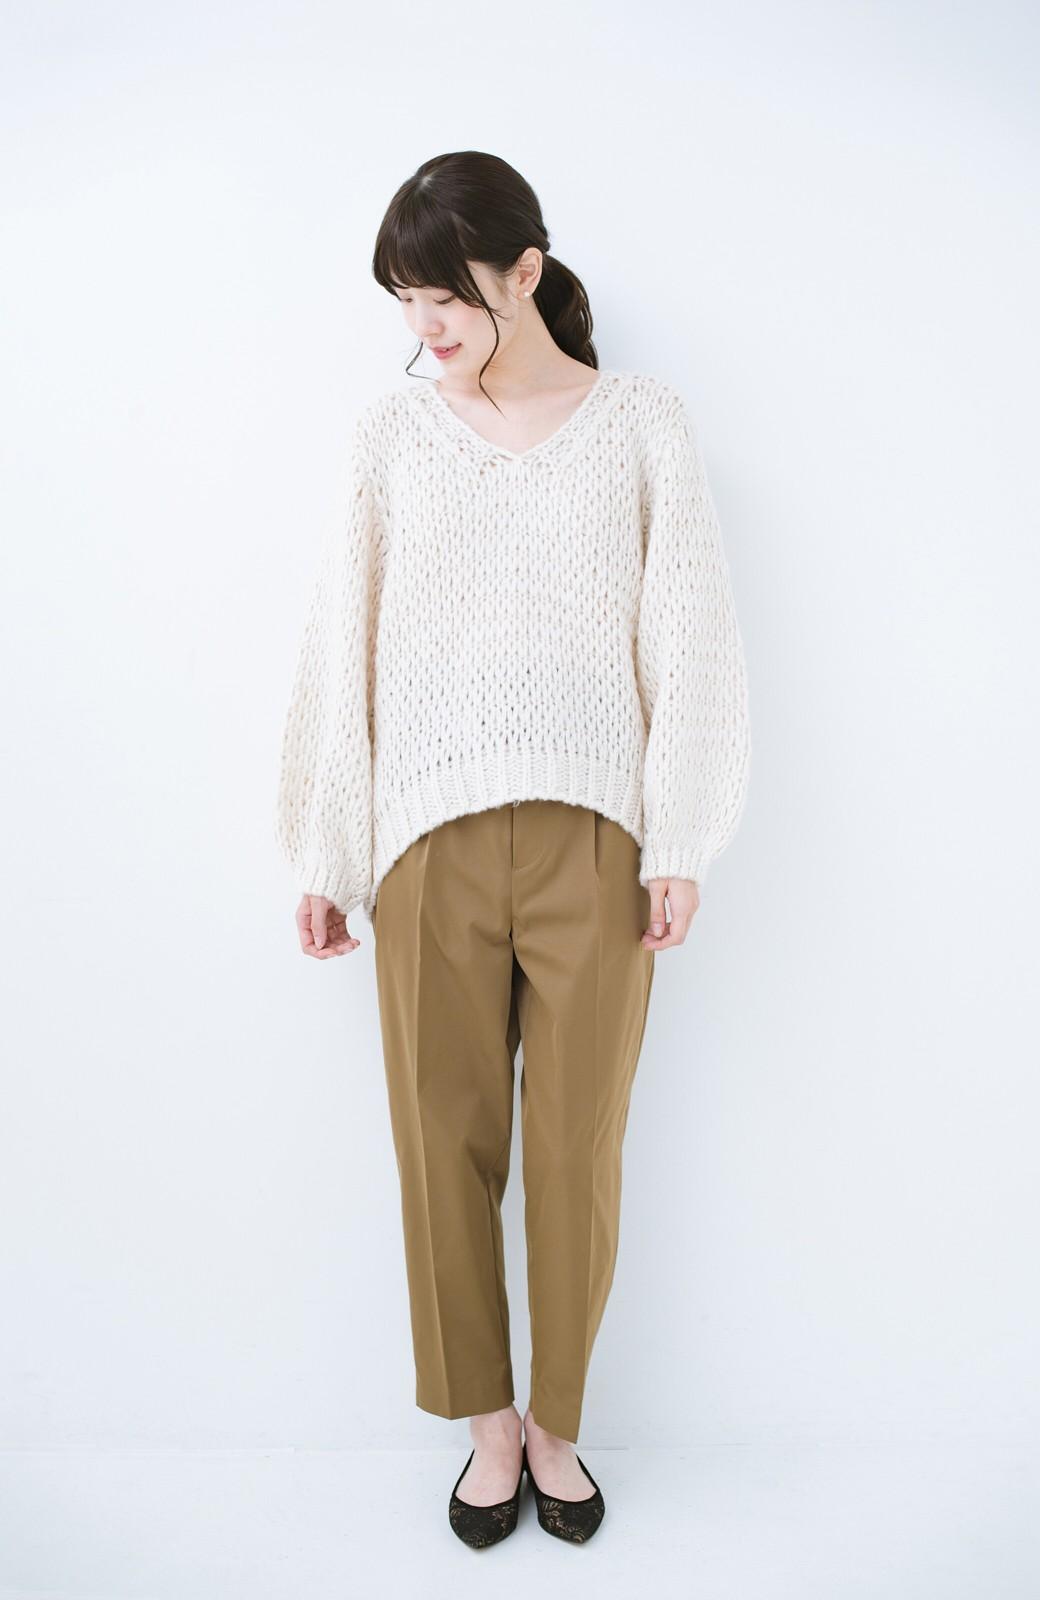 haco! 手編み風のざっくり感で女っぽい Vネックの甘編みルーズニット <アイボリー>の商品写真8